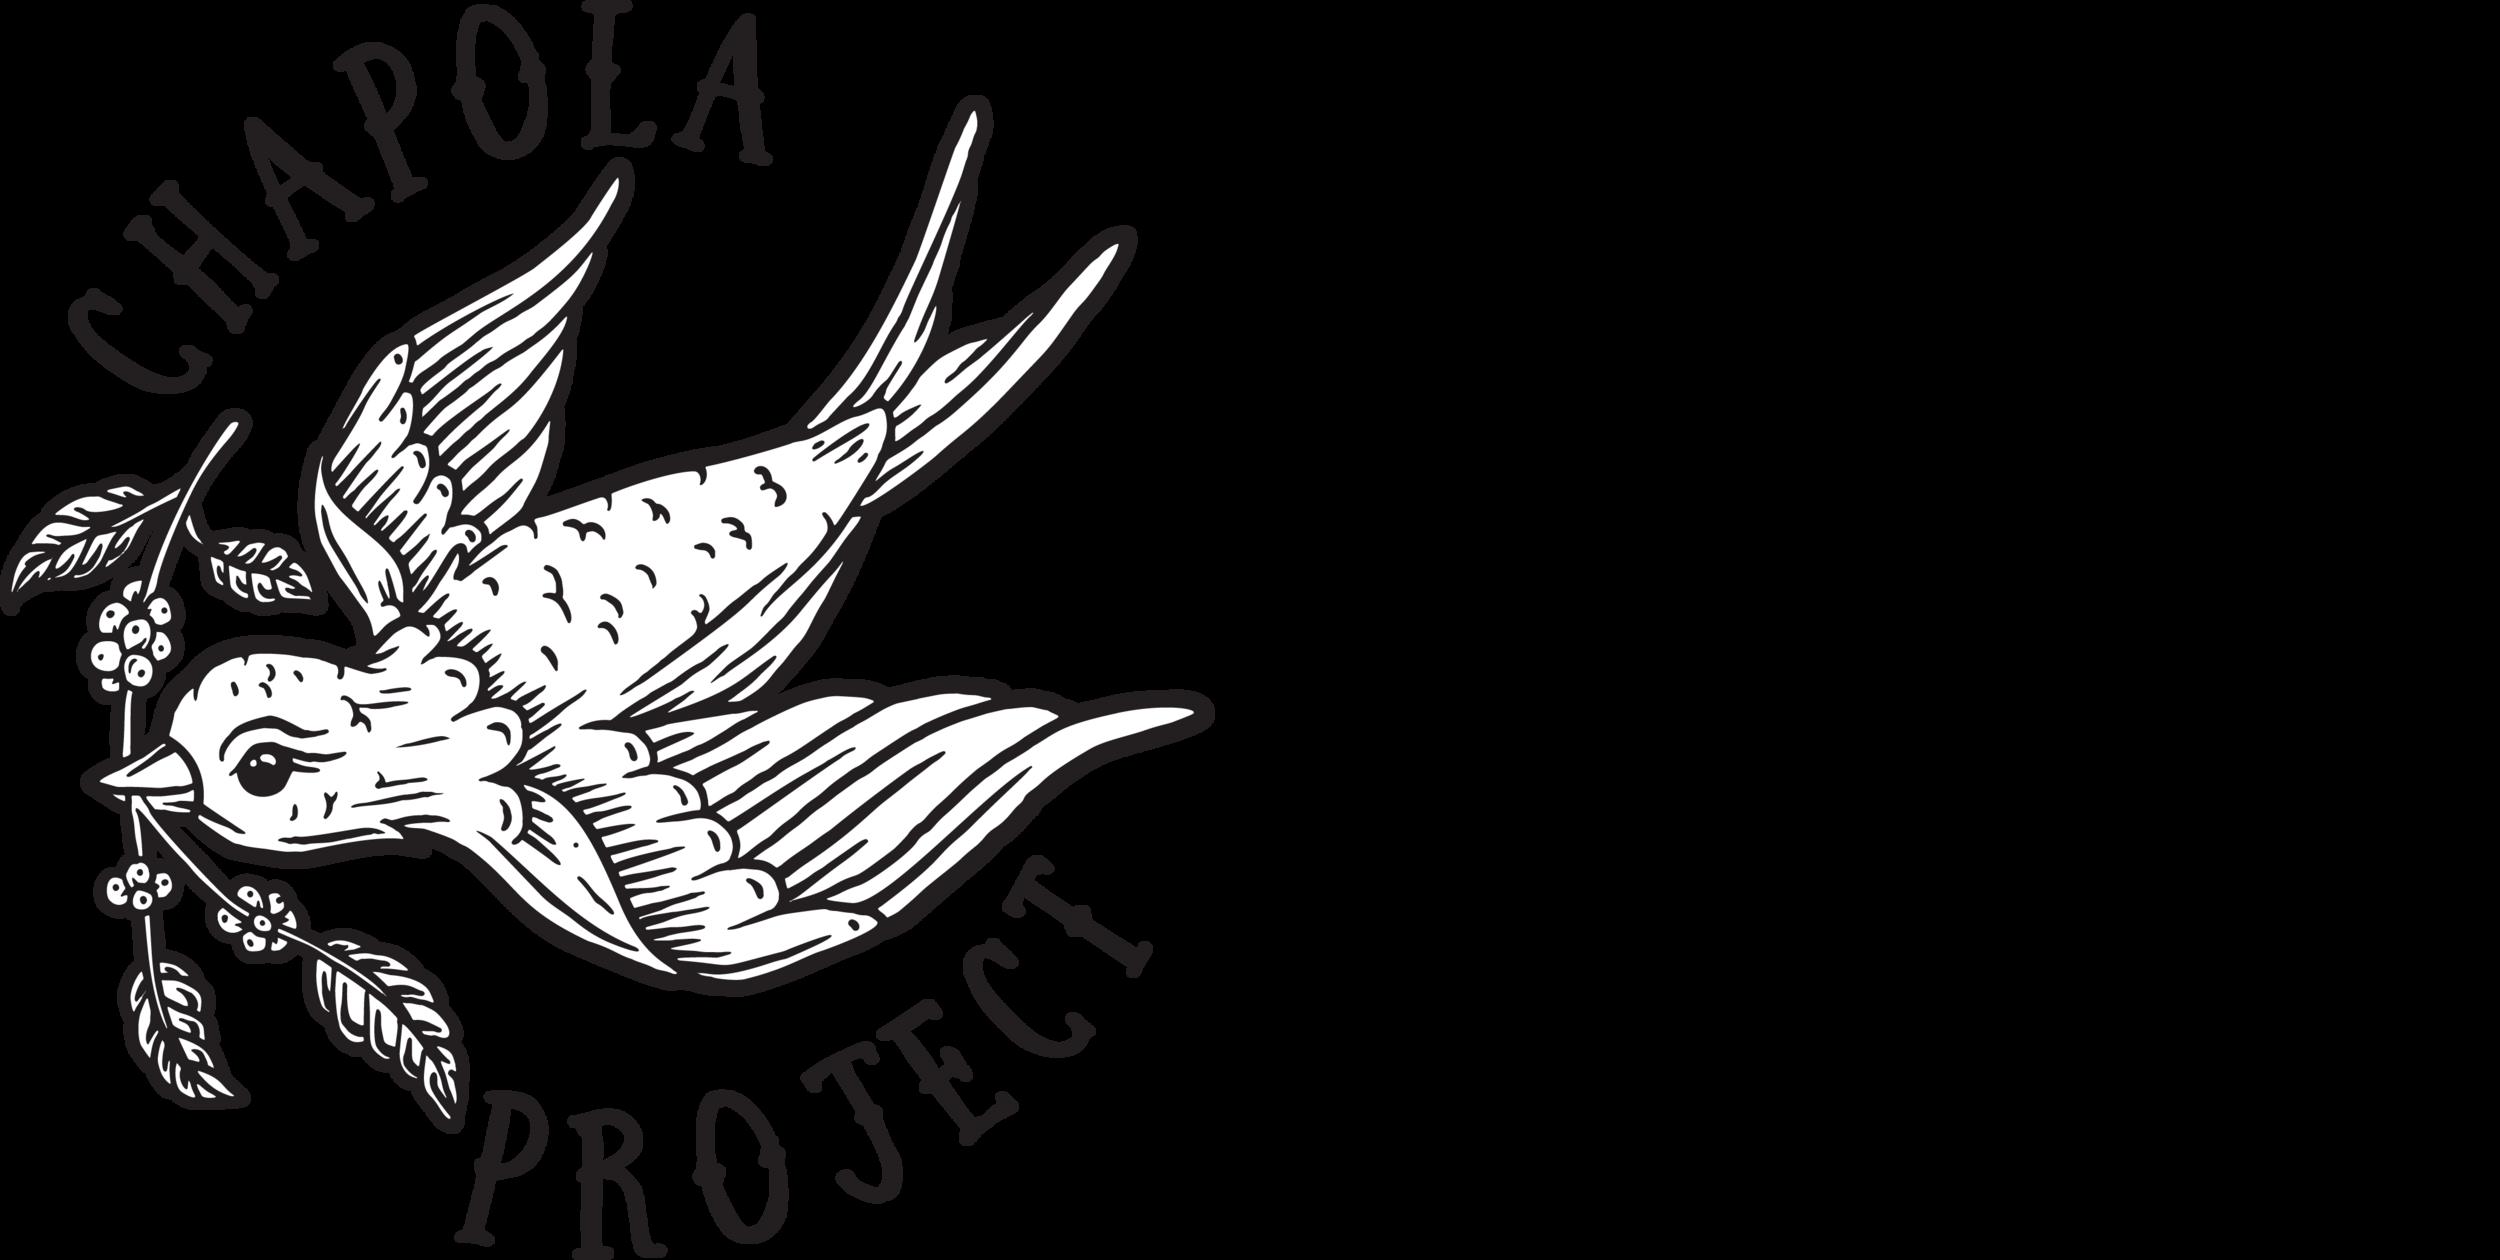 chapola-project